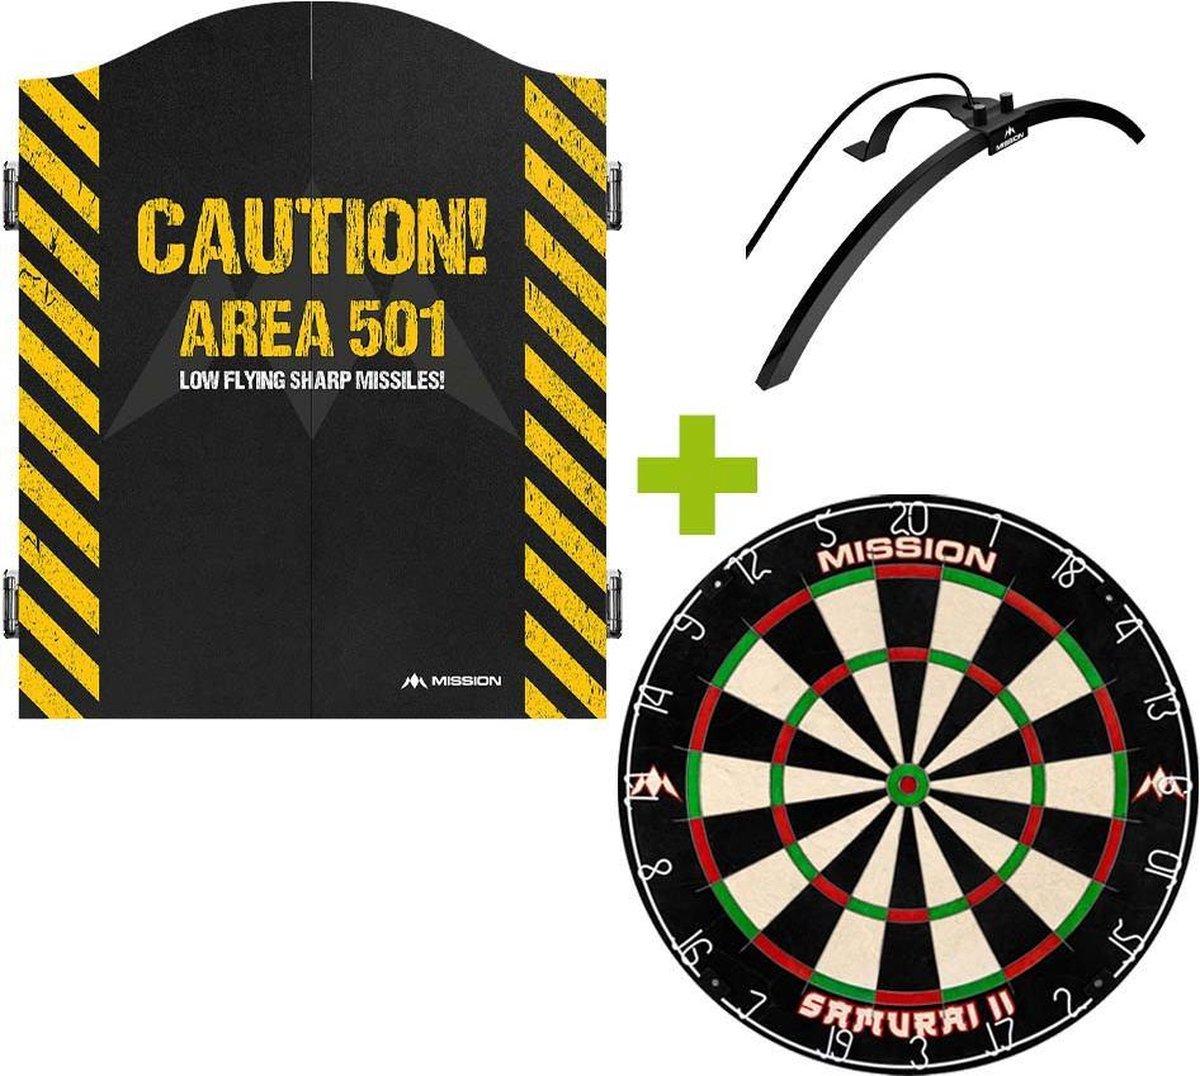 Mission Deluxe Caution 501 Dartkabinet + Mission Samurai 2 +